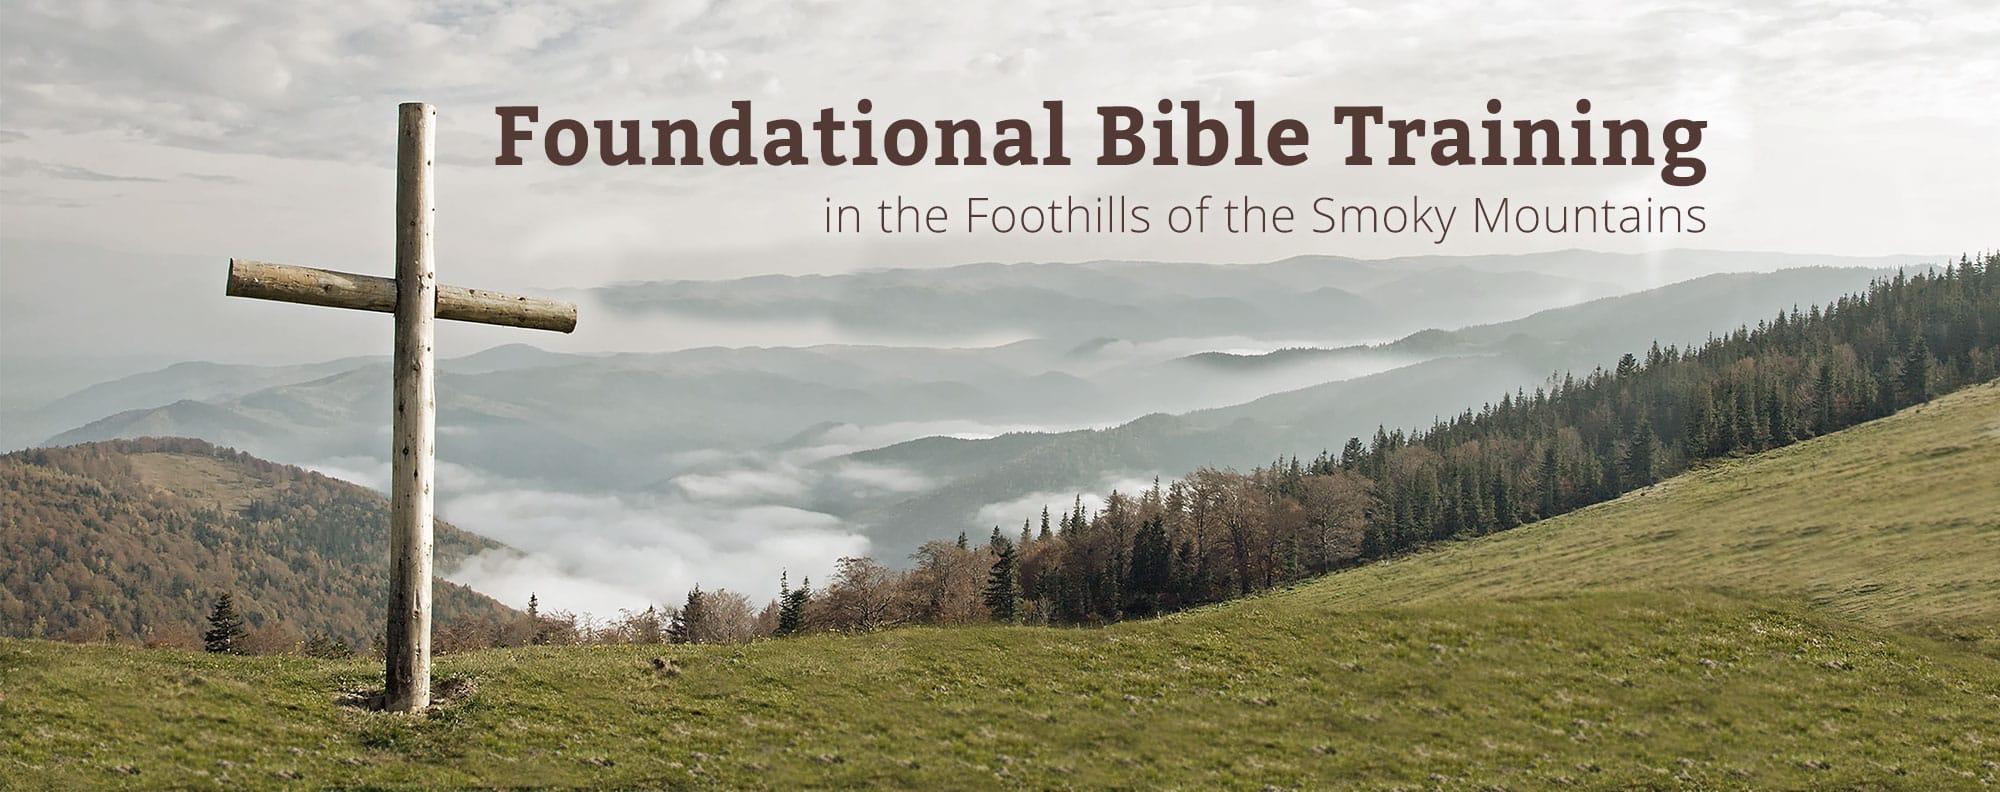 Camp Areté - Foundational Bible Training